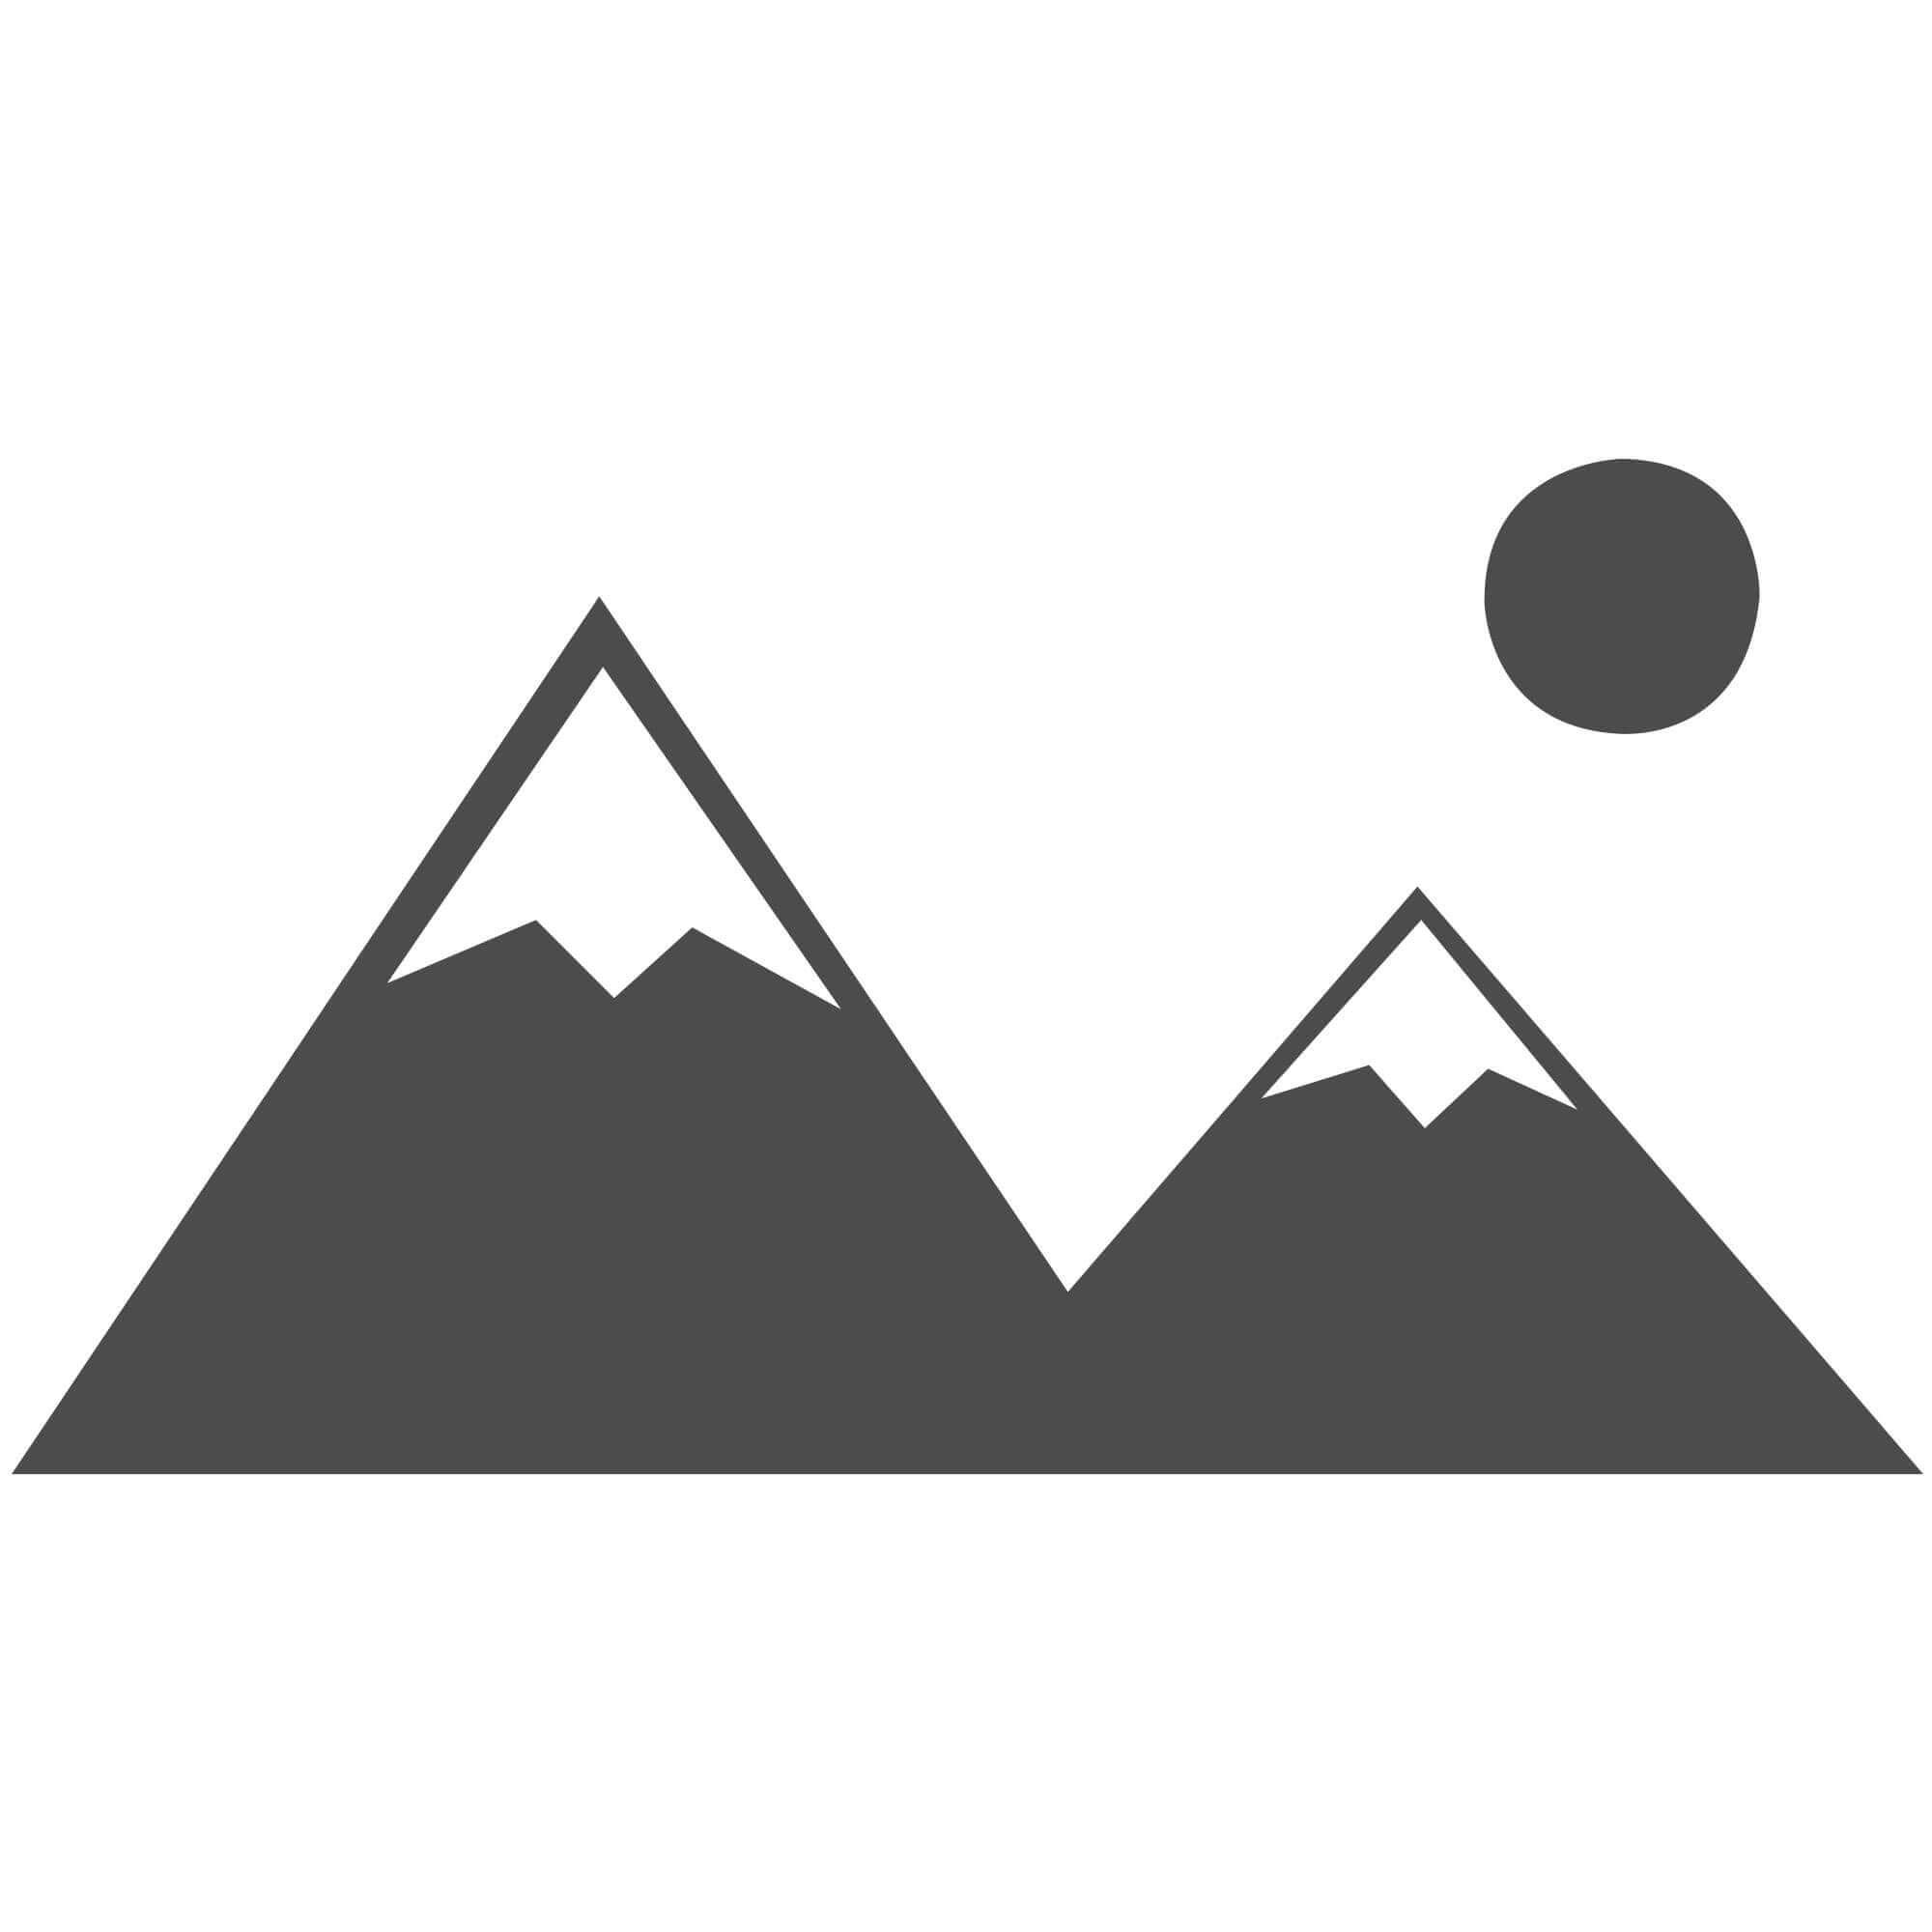 "Velvet Shaggy Rug - Pink - Size 80 x 150 cm (2'8"" x 5')"